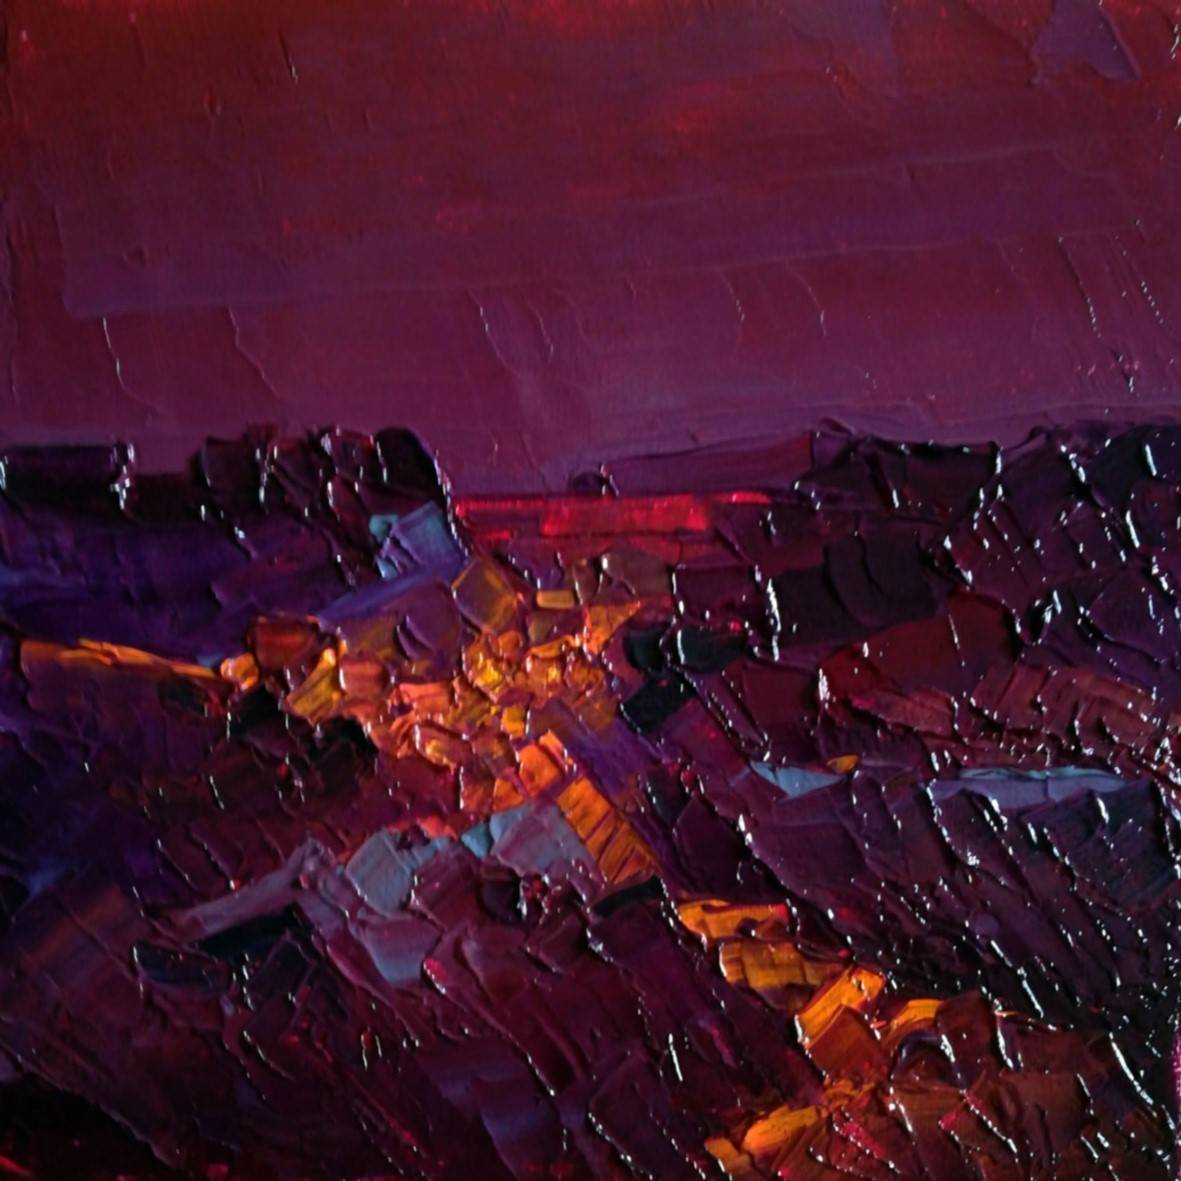 Cabo de Gata. 2019 óleo espátula lienzo 16 x 15 cm. http://bohemiogus.blogspot.com